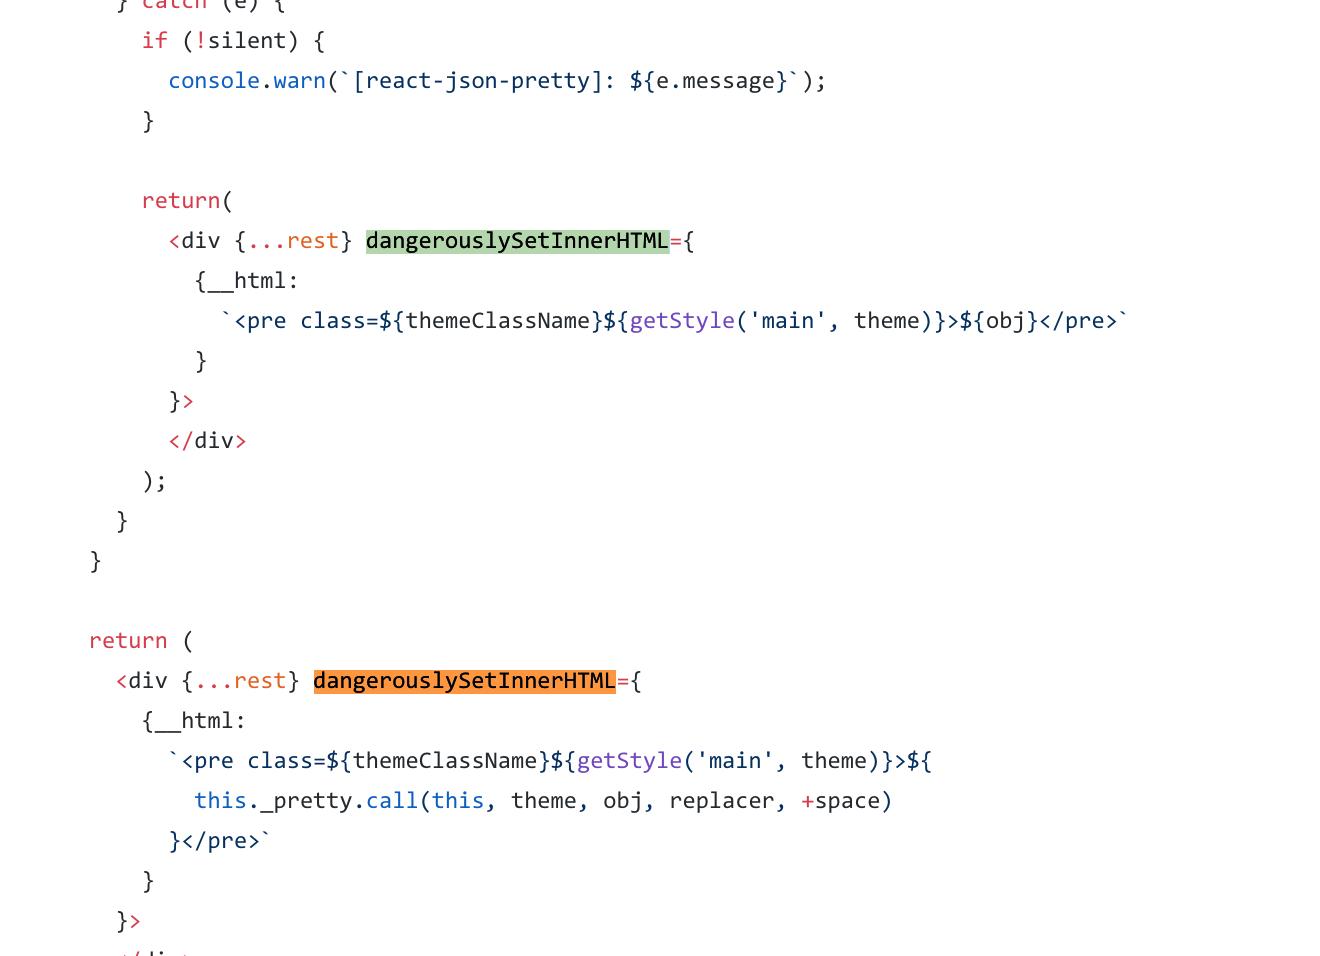 JSONPRETTY - Java code to get jenkins data, build history